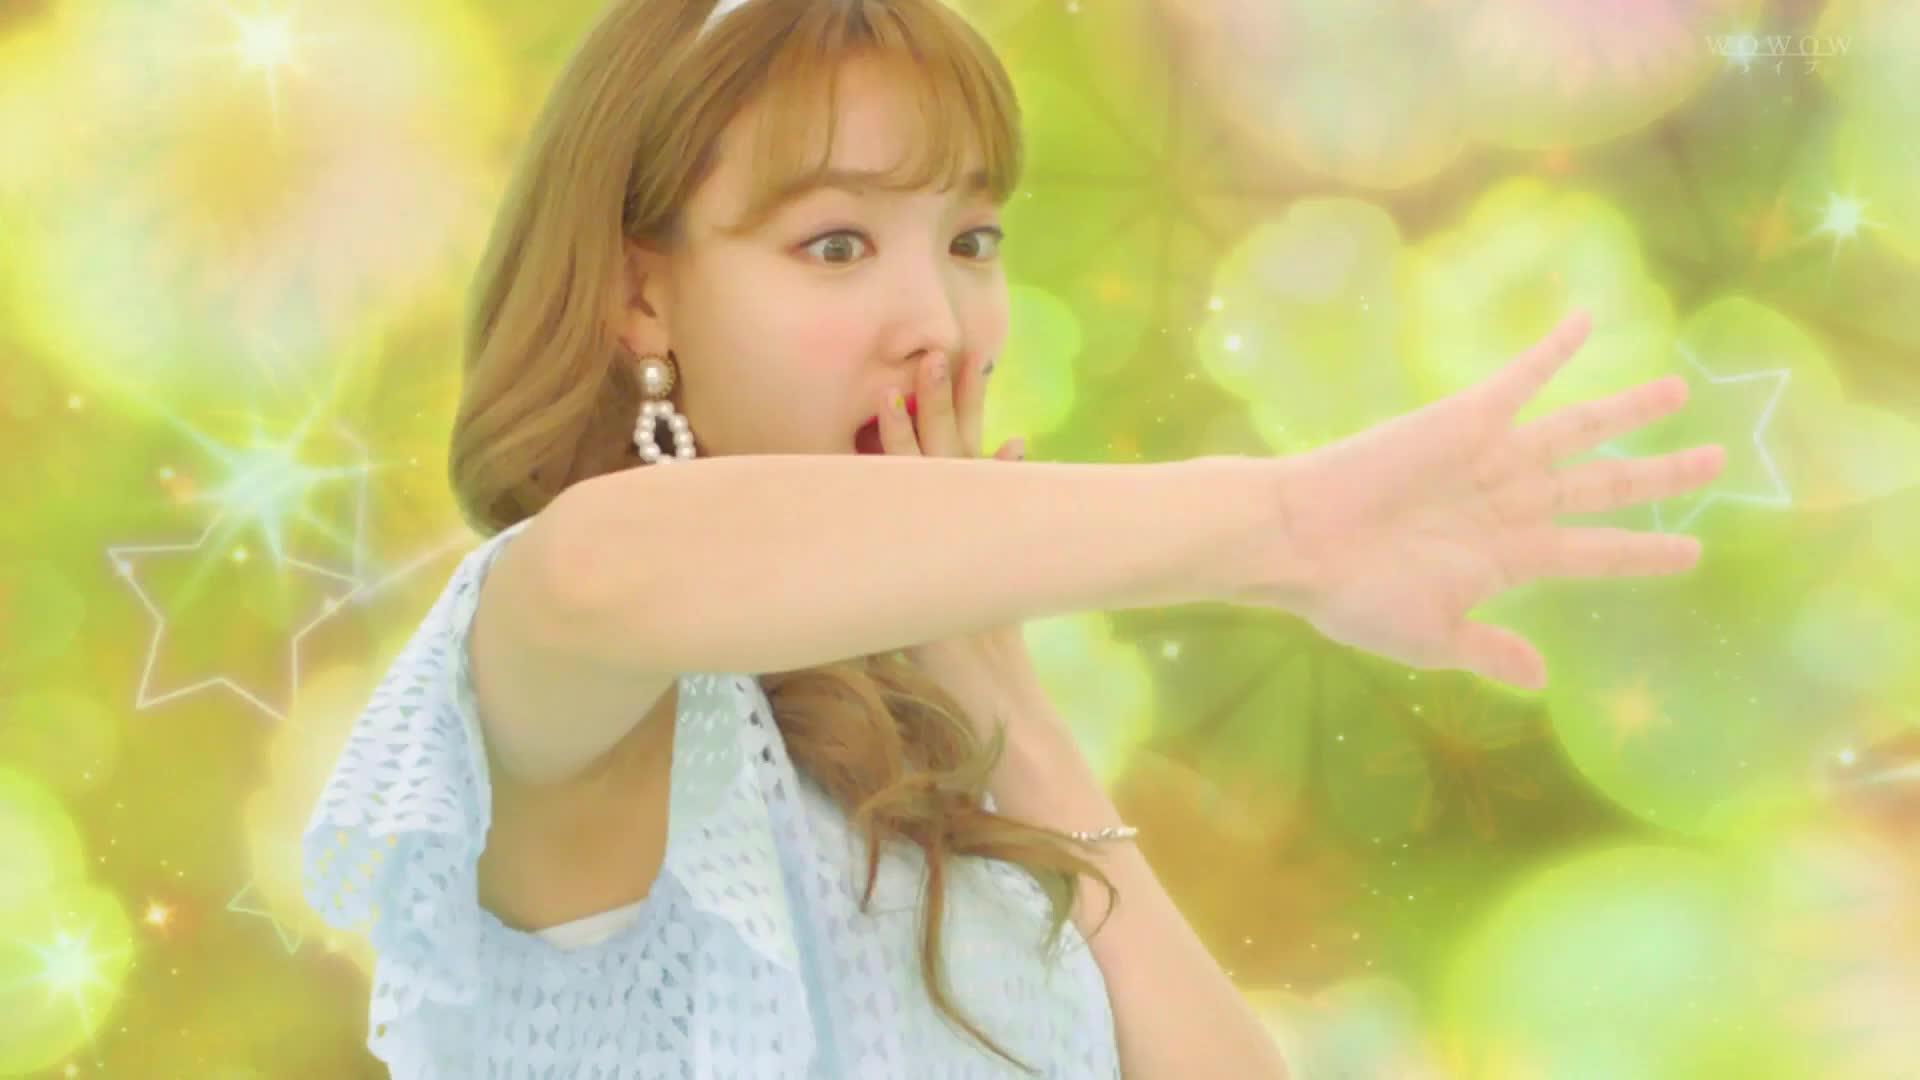 dreamday, Cutie Candy Pop Nayeon GIFs